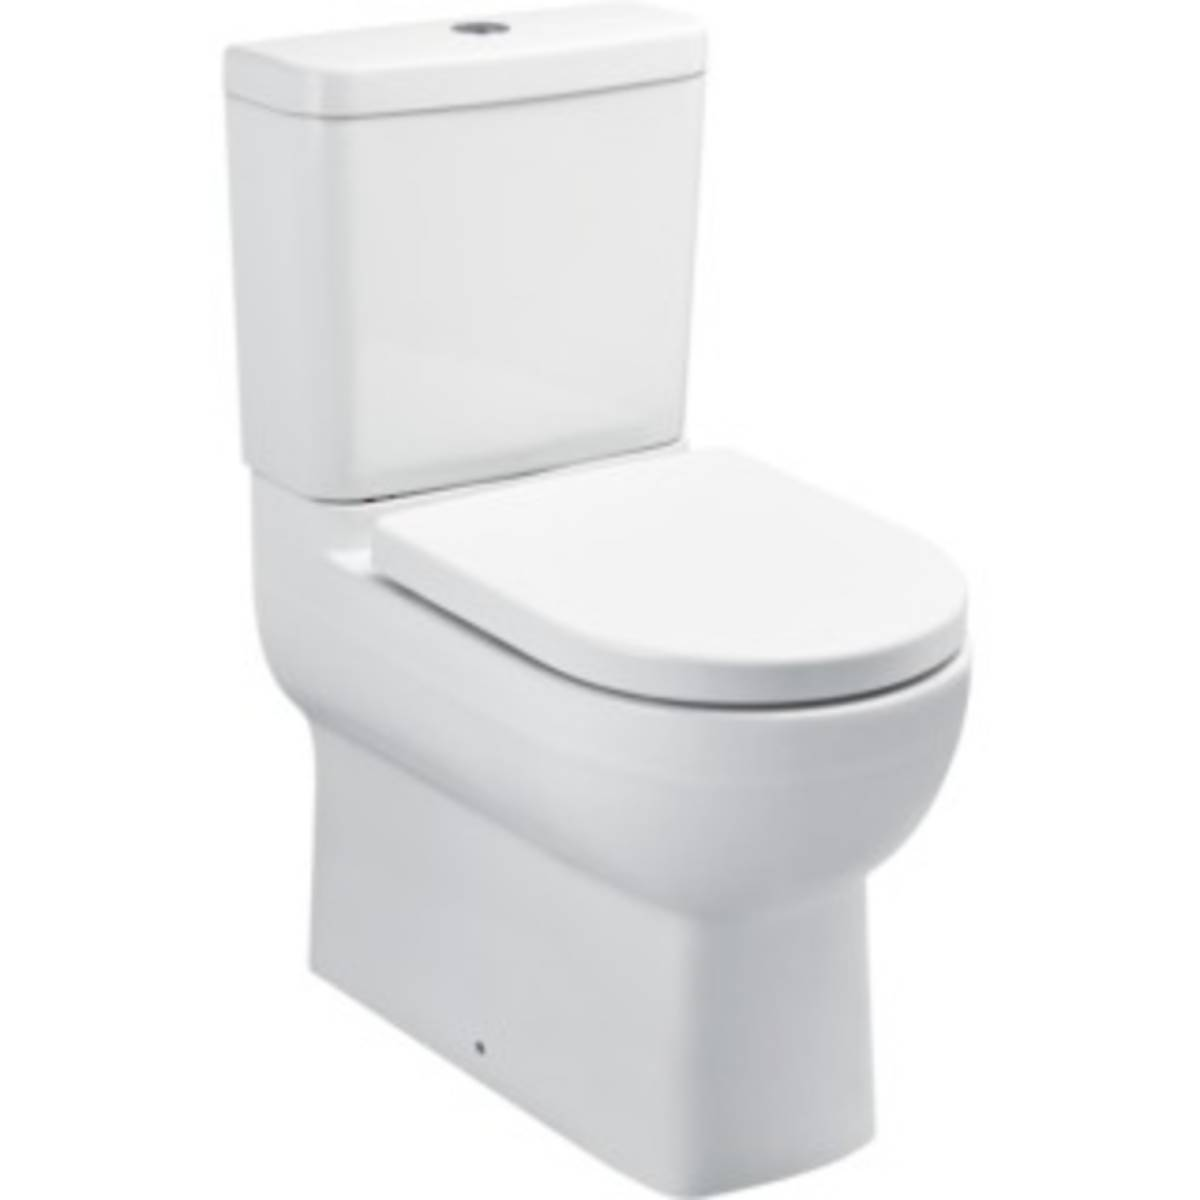 View Photo: Https://www.sinkandbathroomshop.com.au/shop/toilets/back-to-wall-toilet-suites/lambada-btw-toilet-suite/